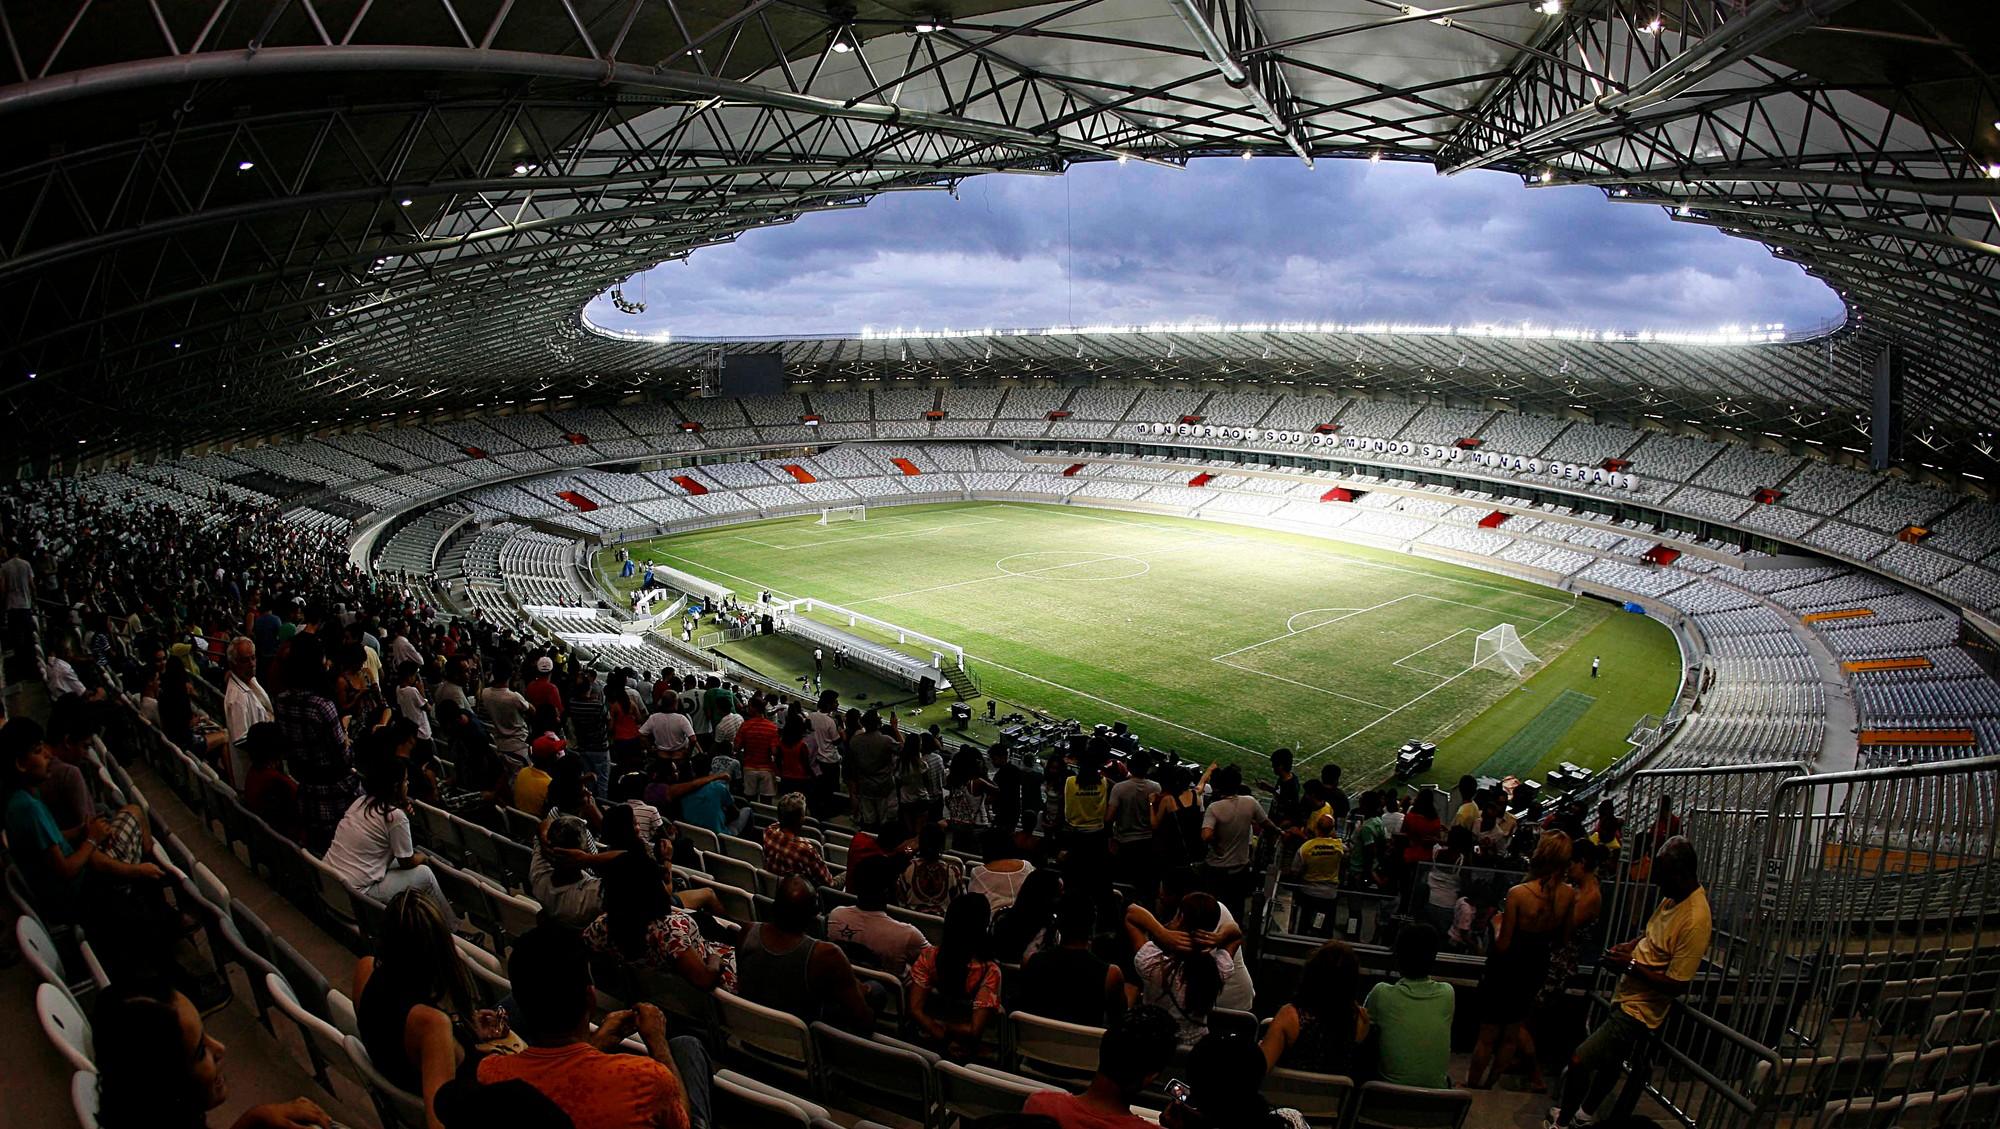 коллегия признала стадион магальяеш фото компаний настоящий момент